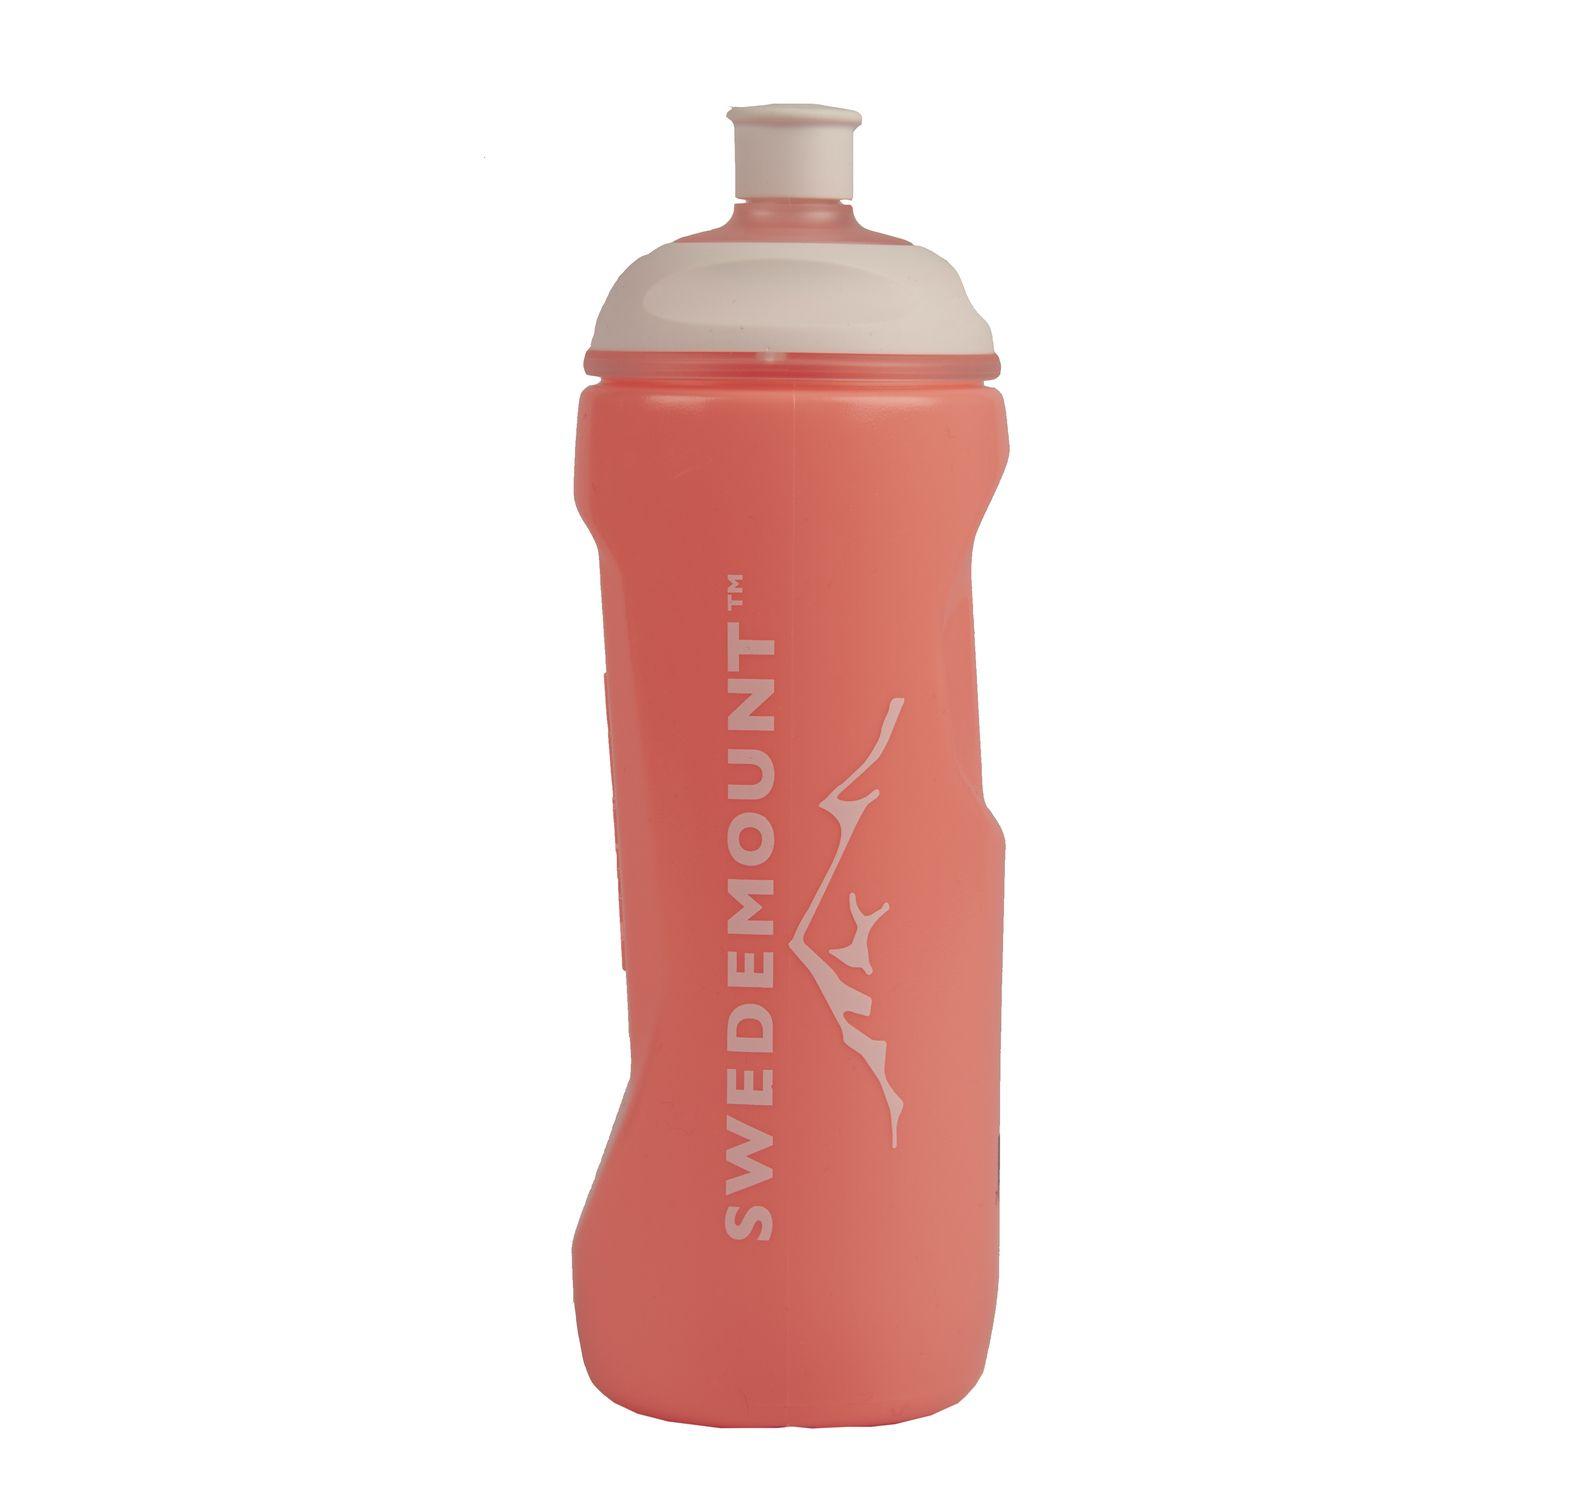 Swedemount Plastic Bottle, Mango, Ones, Swedemount